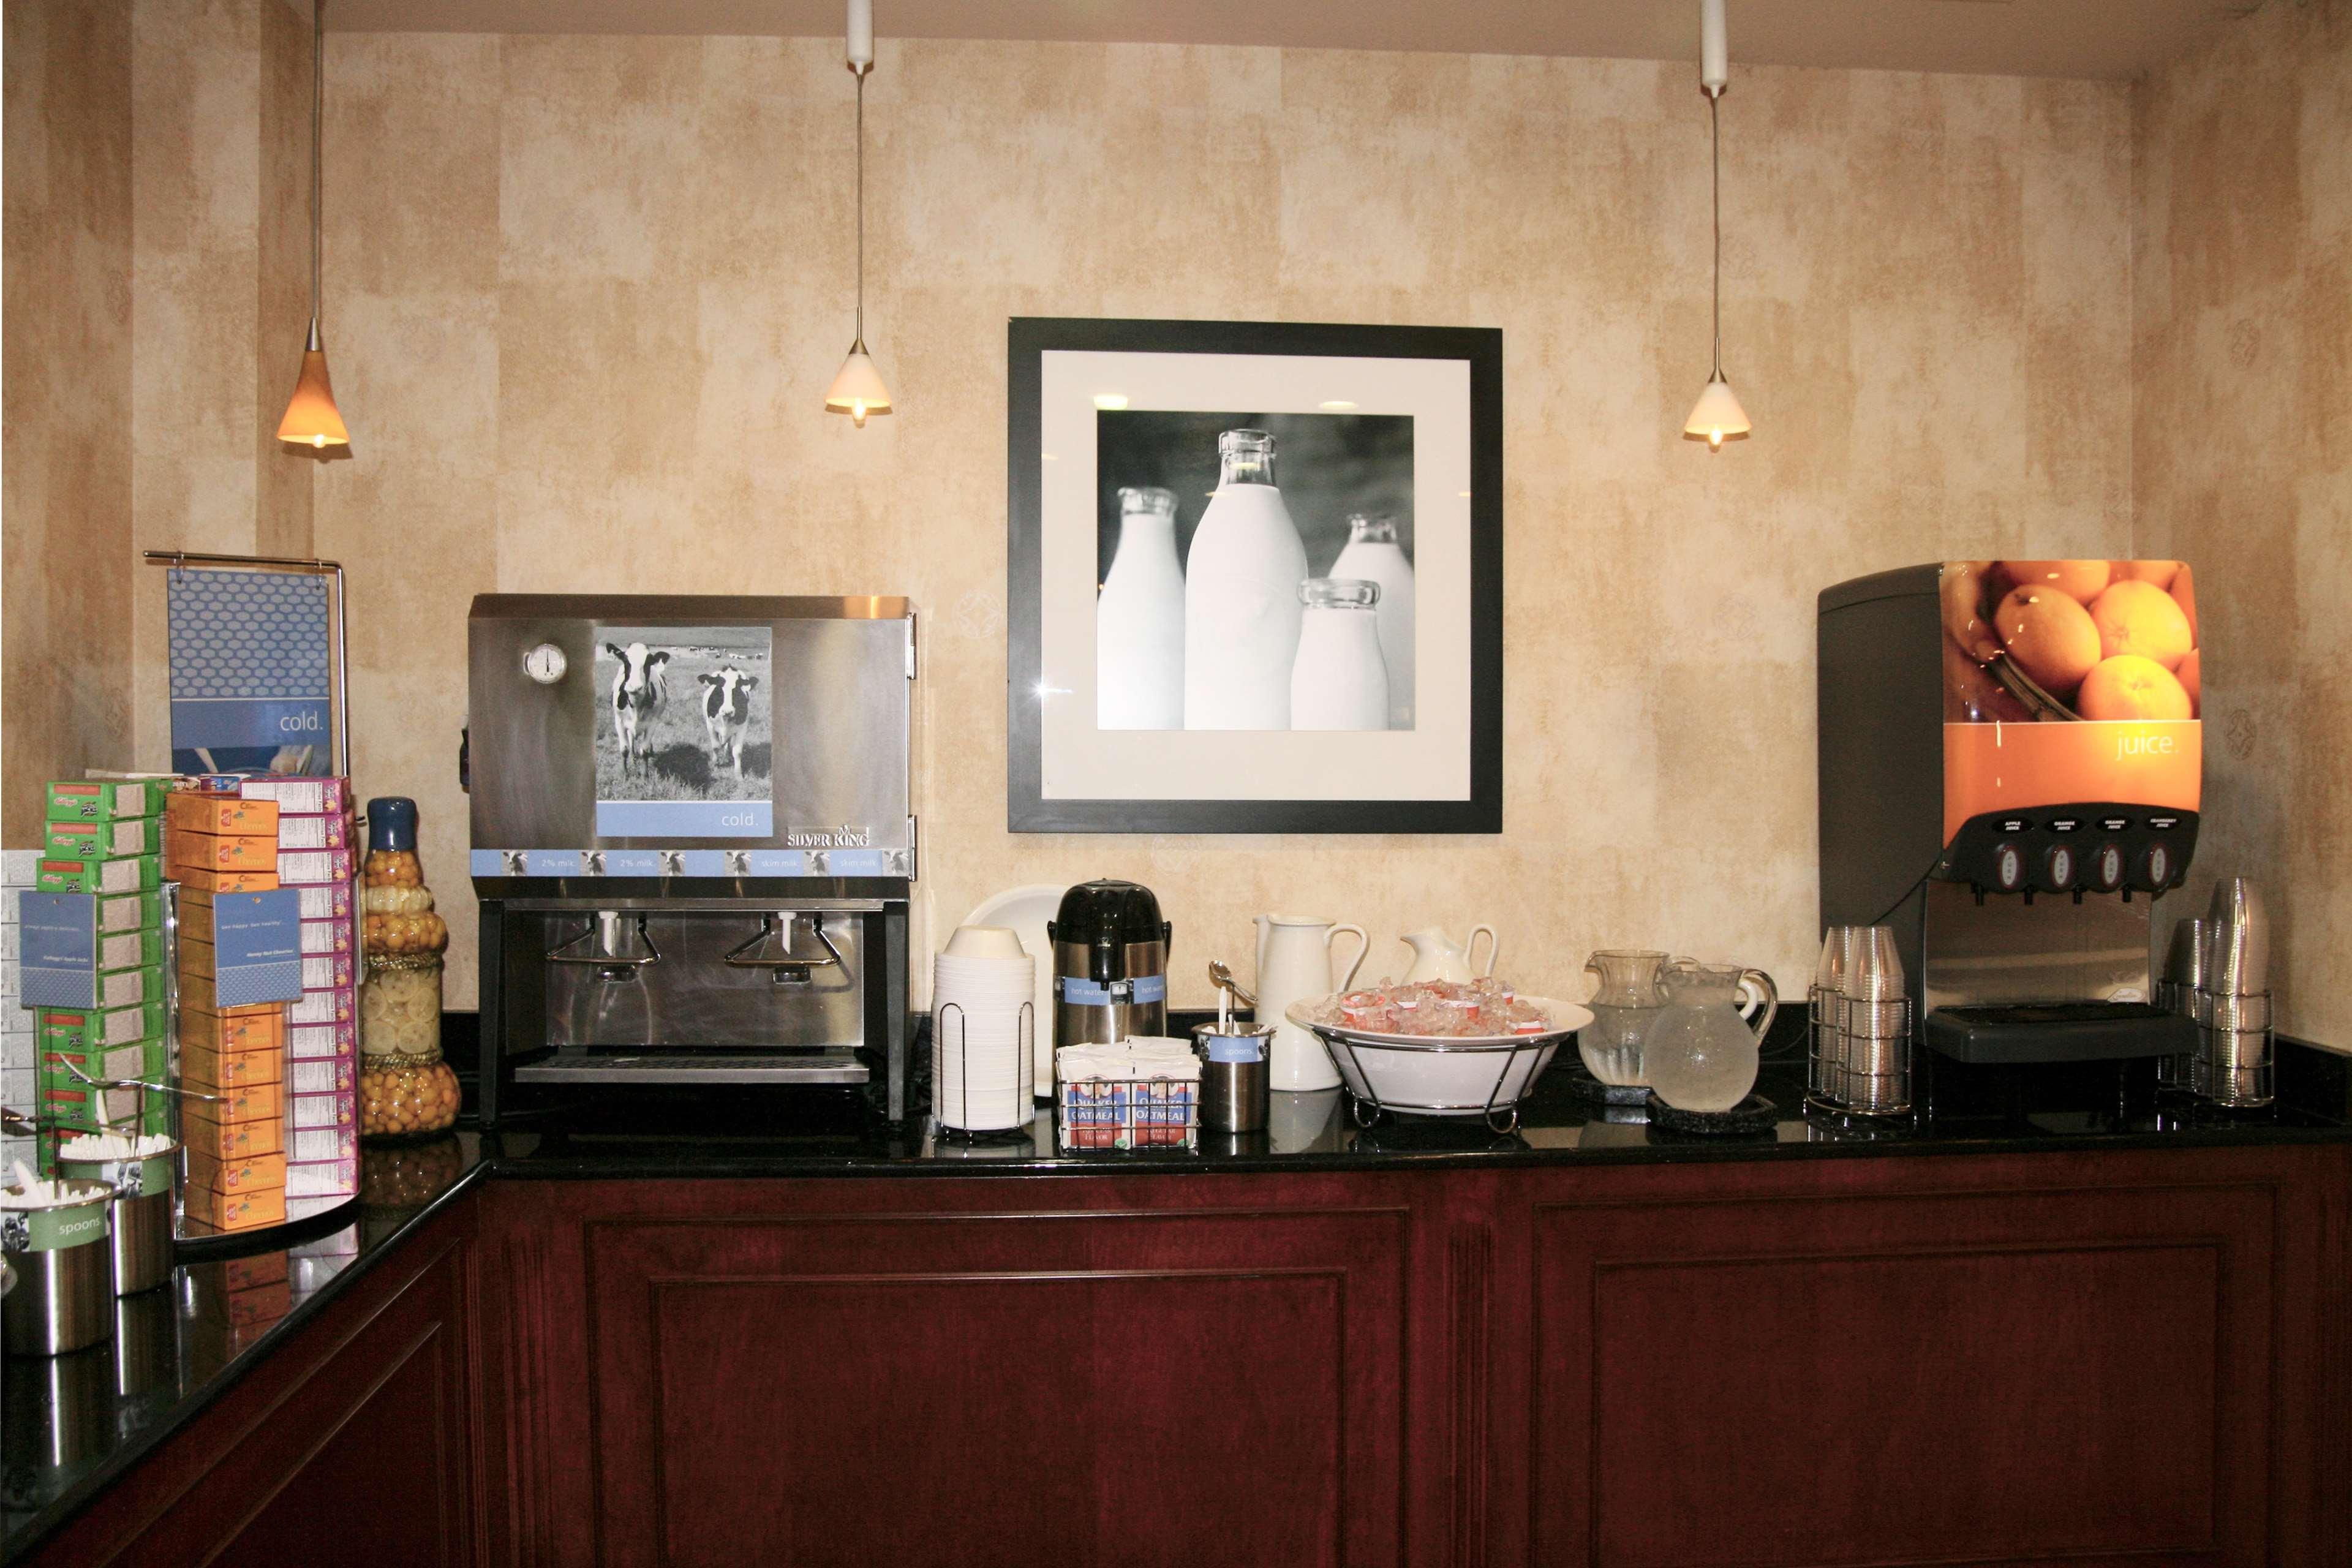 Hampton Inn & Suites Bolingbrook image 15